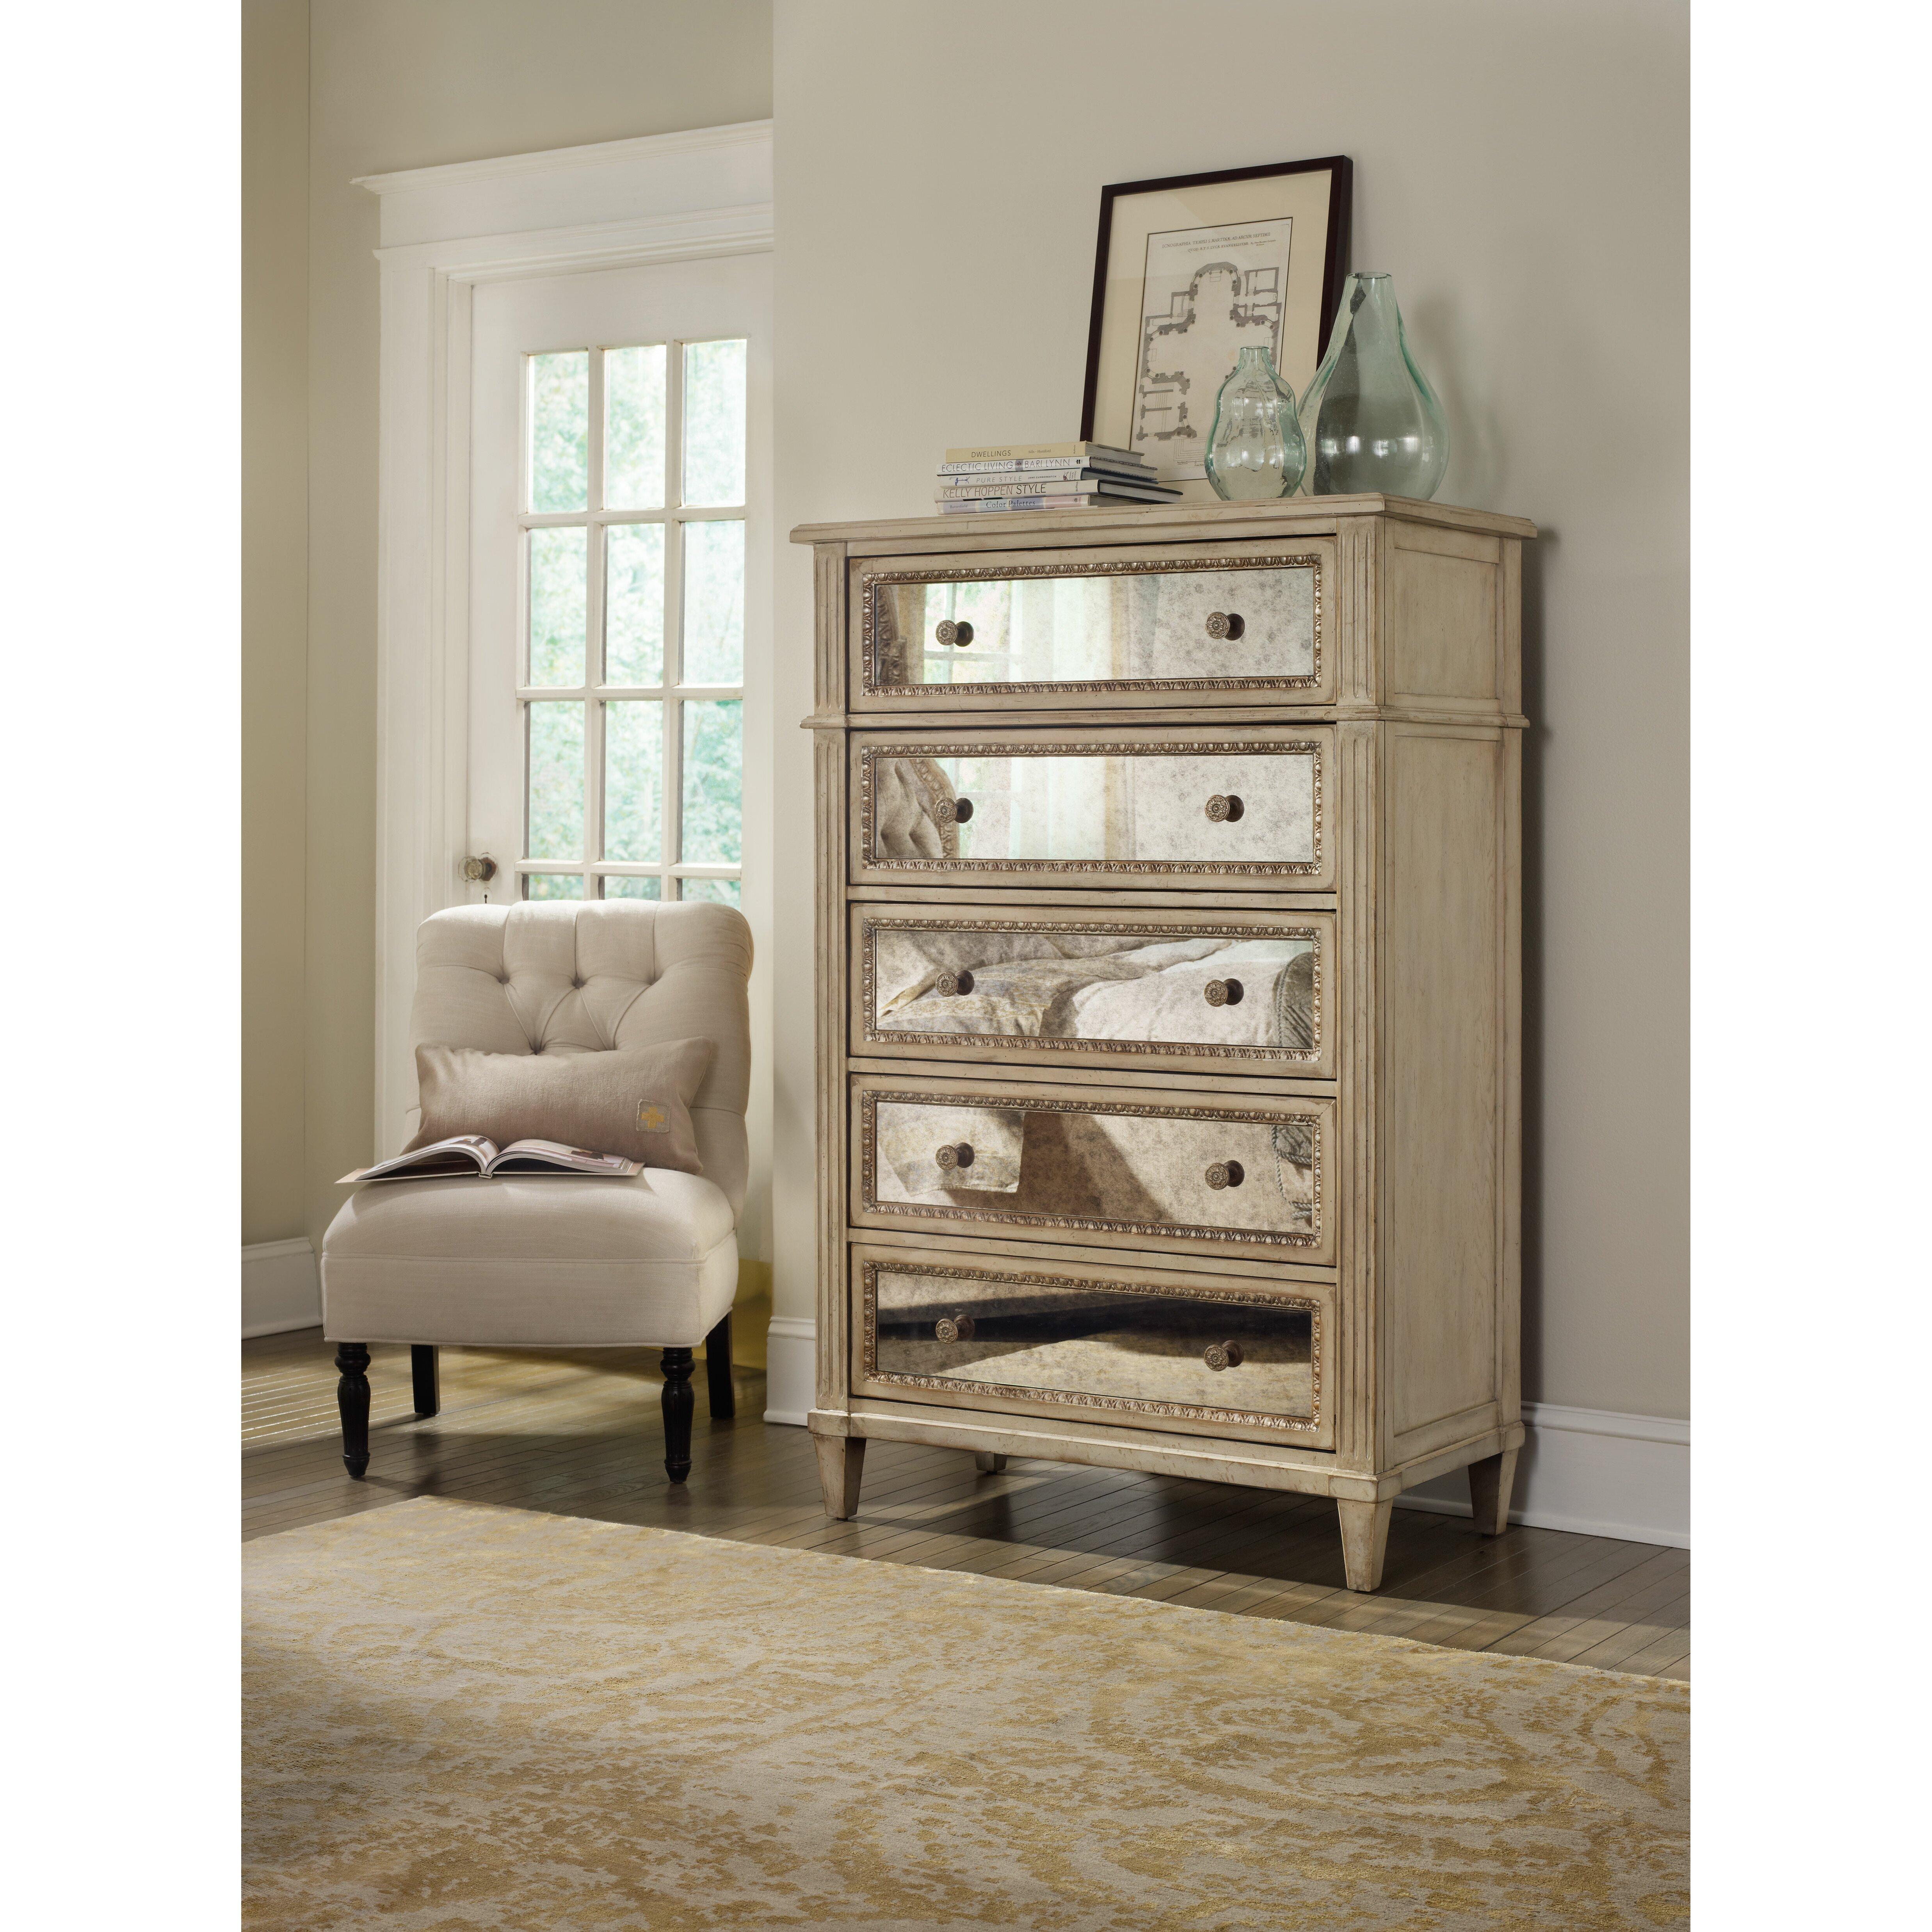 Hooker Furniture Sanctuary 5 Drawer Chest Reviews Wayfair